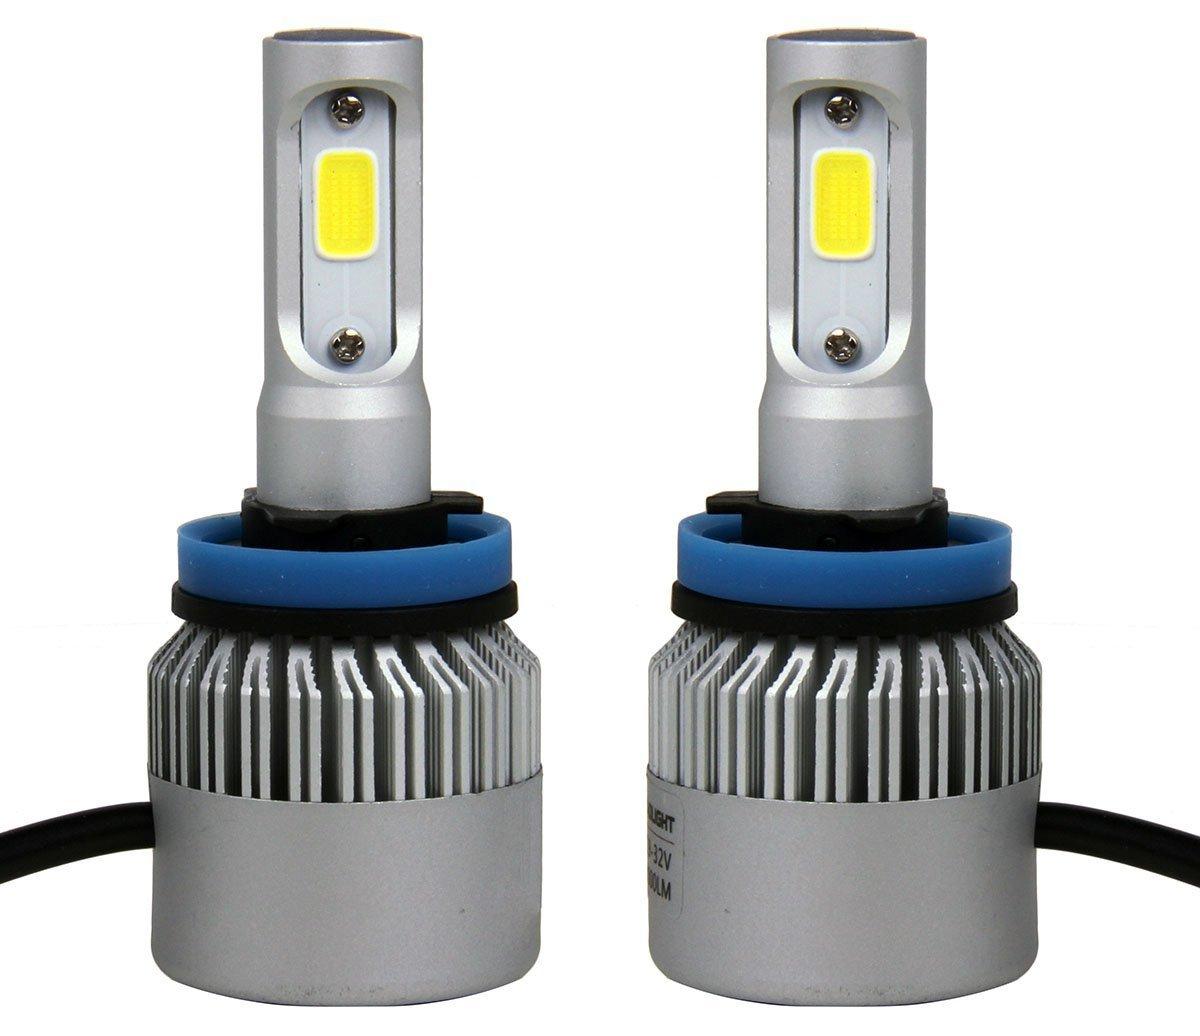 Amazon com: 8000 Lumens COB Led Headlights for 2012 BUICK VERANO Fog